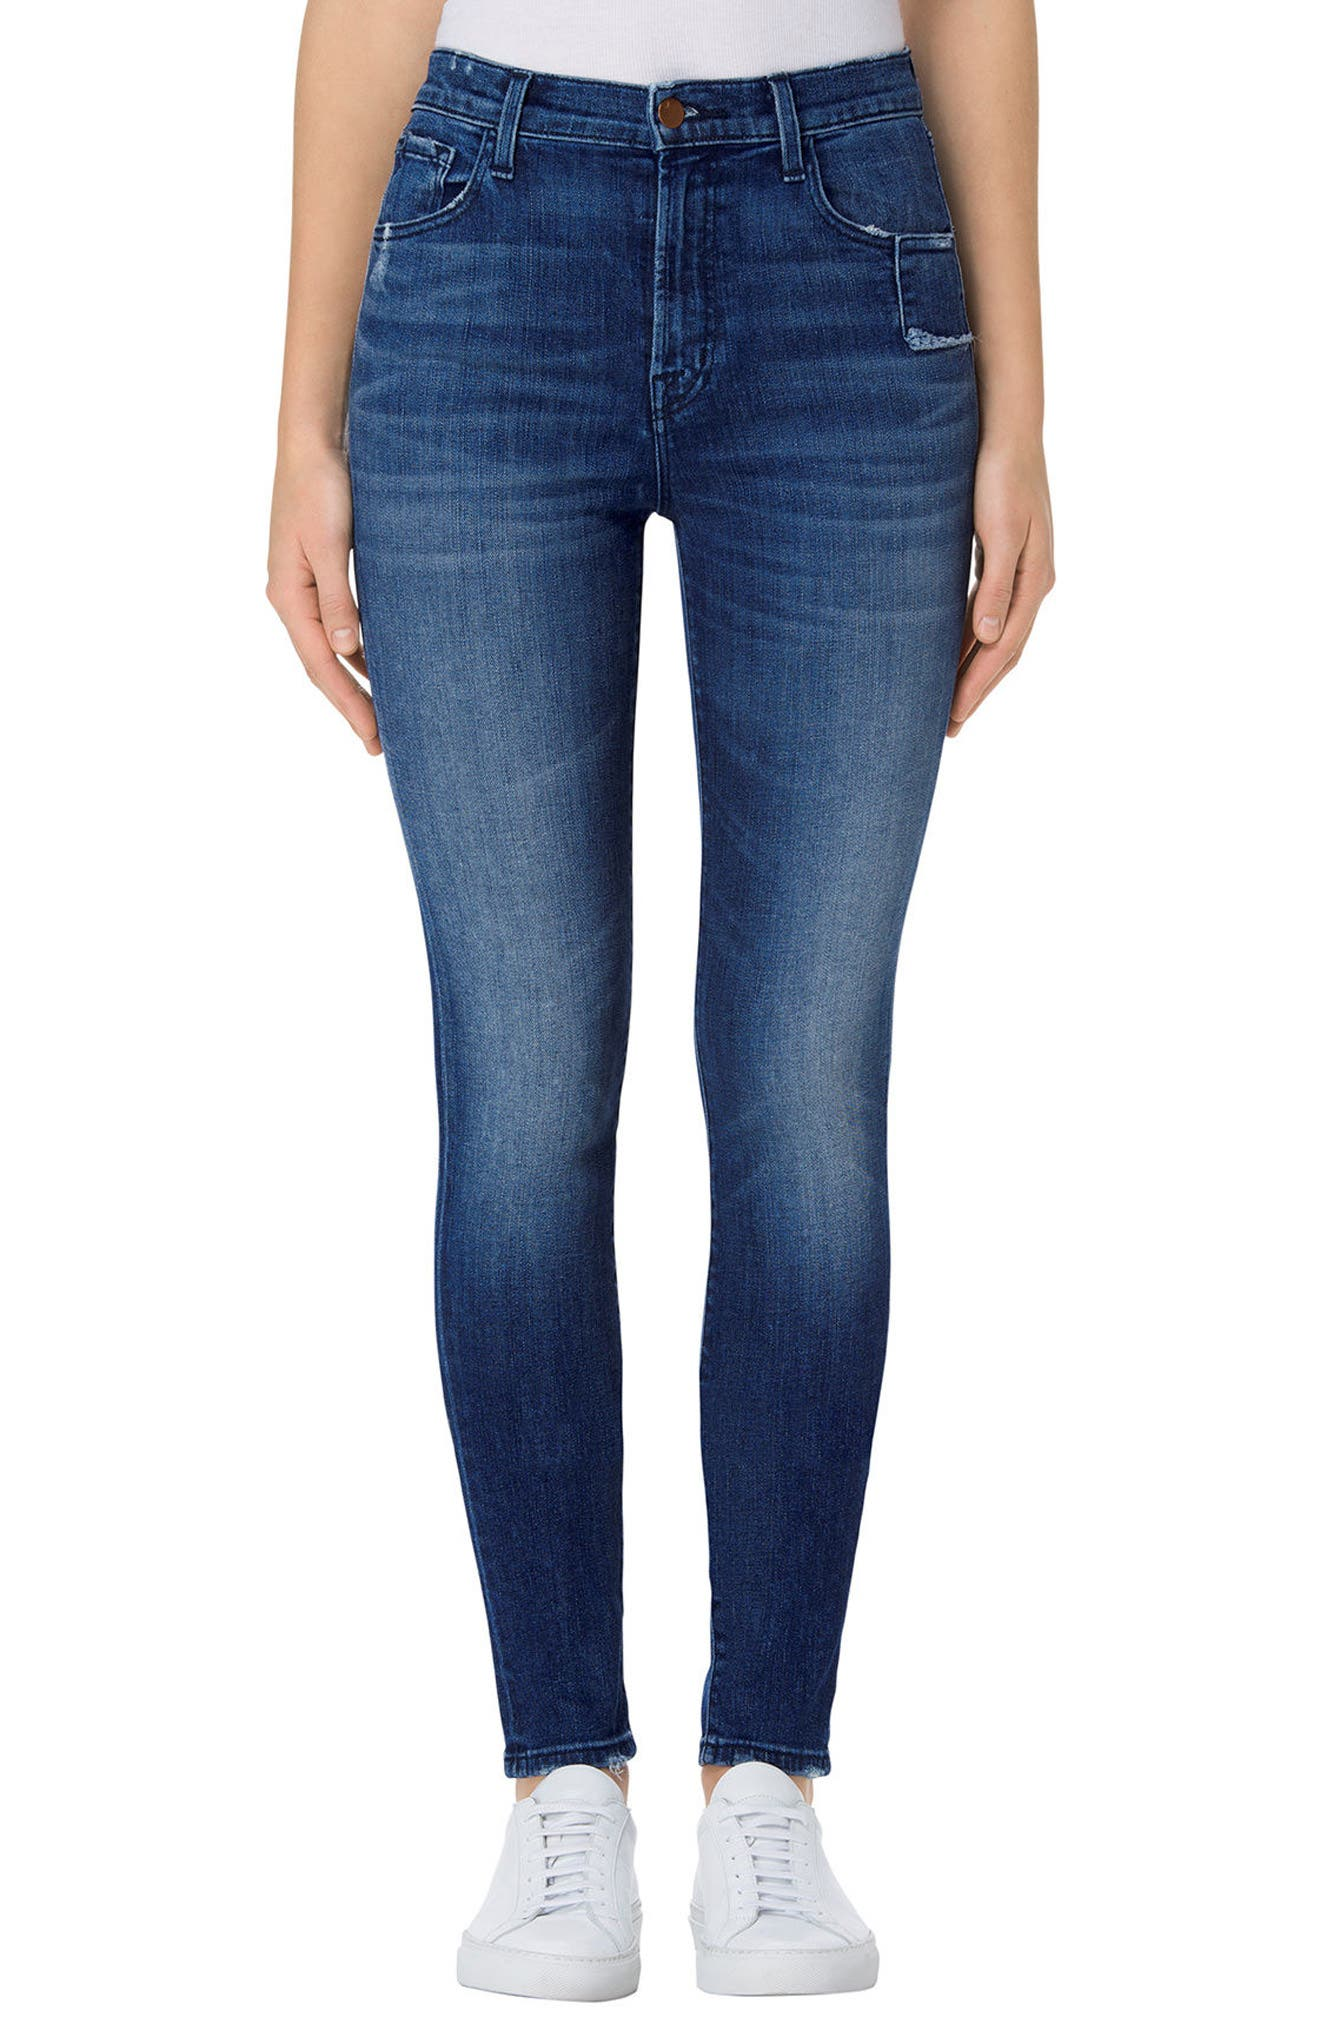 Main Image - J Brand Carolina Super High Rise Skinny Jeans (Gone)